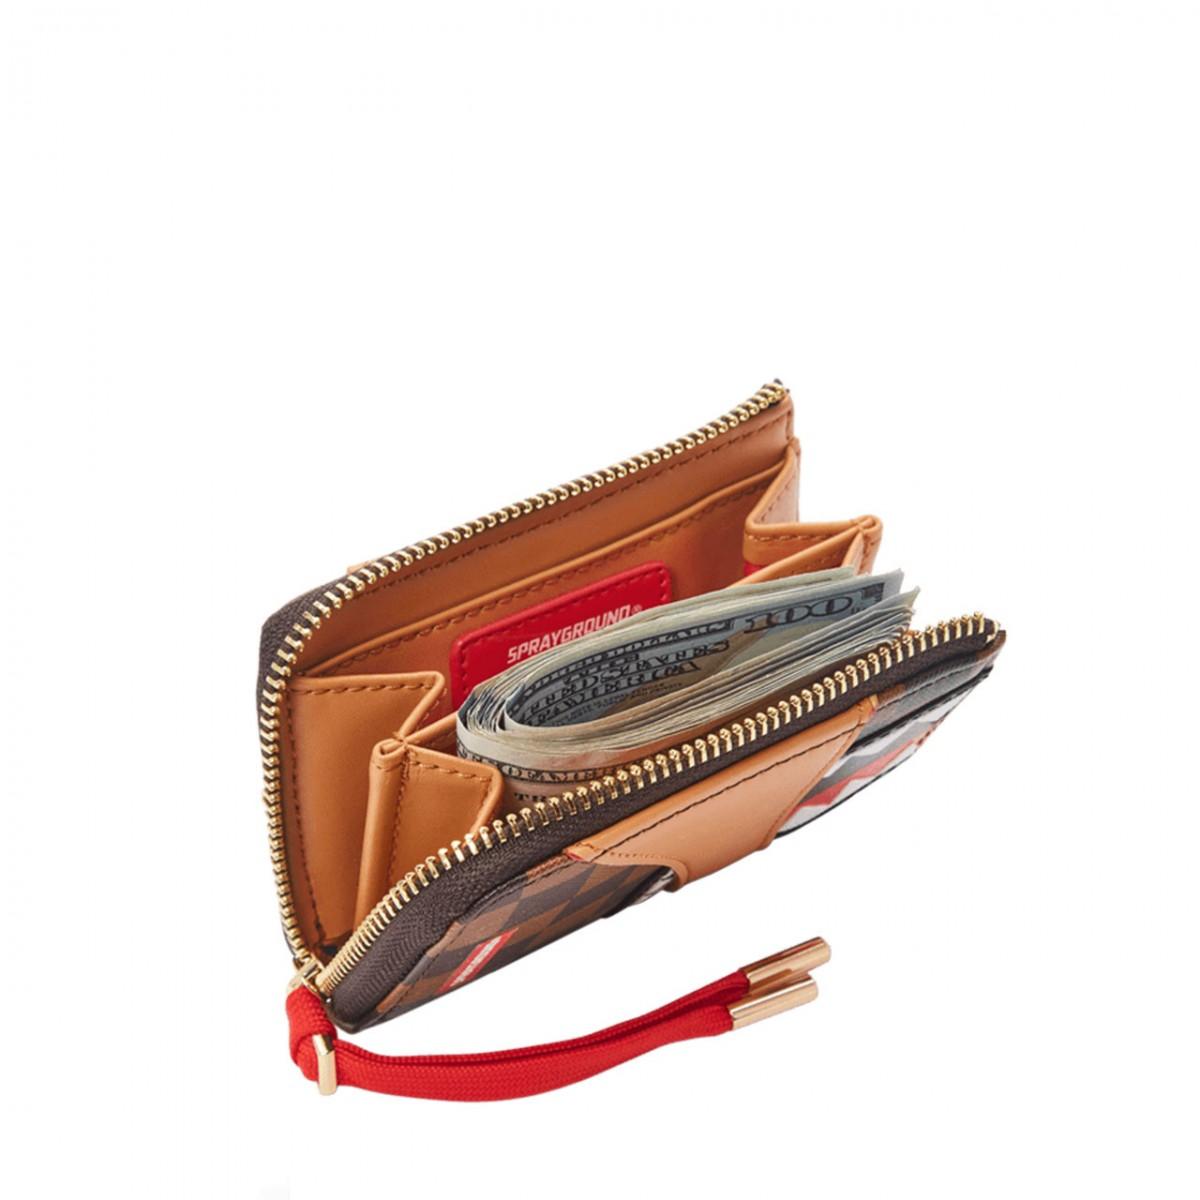 SPRAYGROUND | Wallets  | 910W3938NSZMARRONE